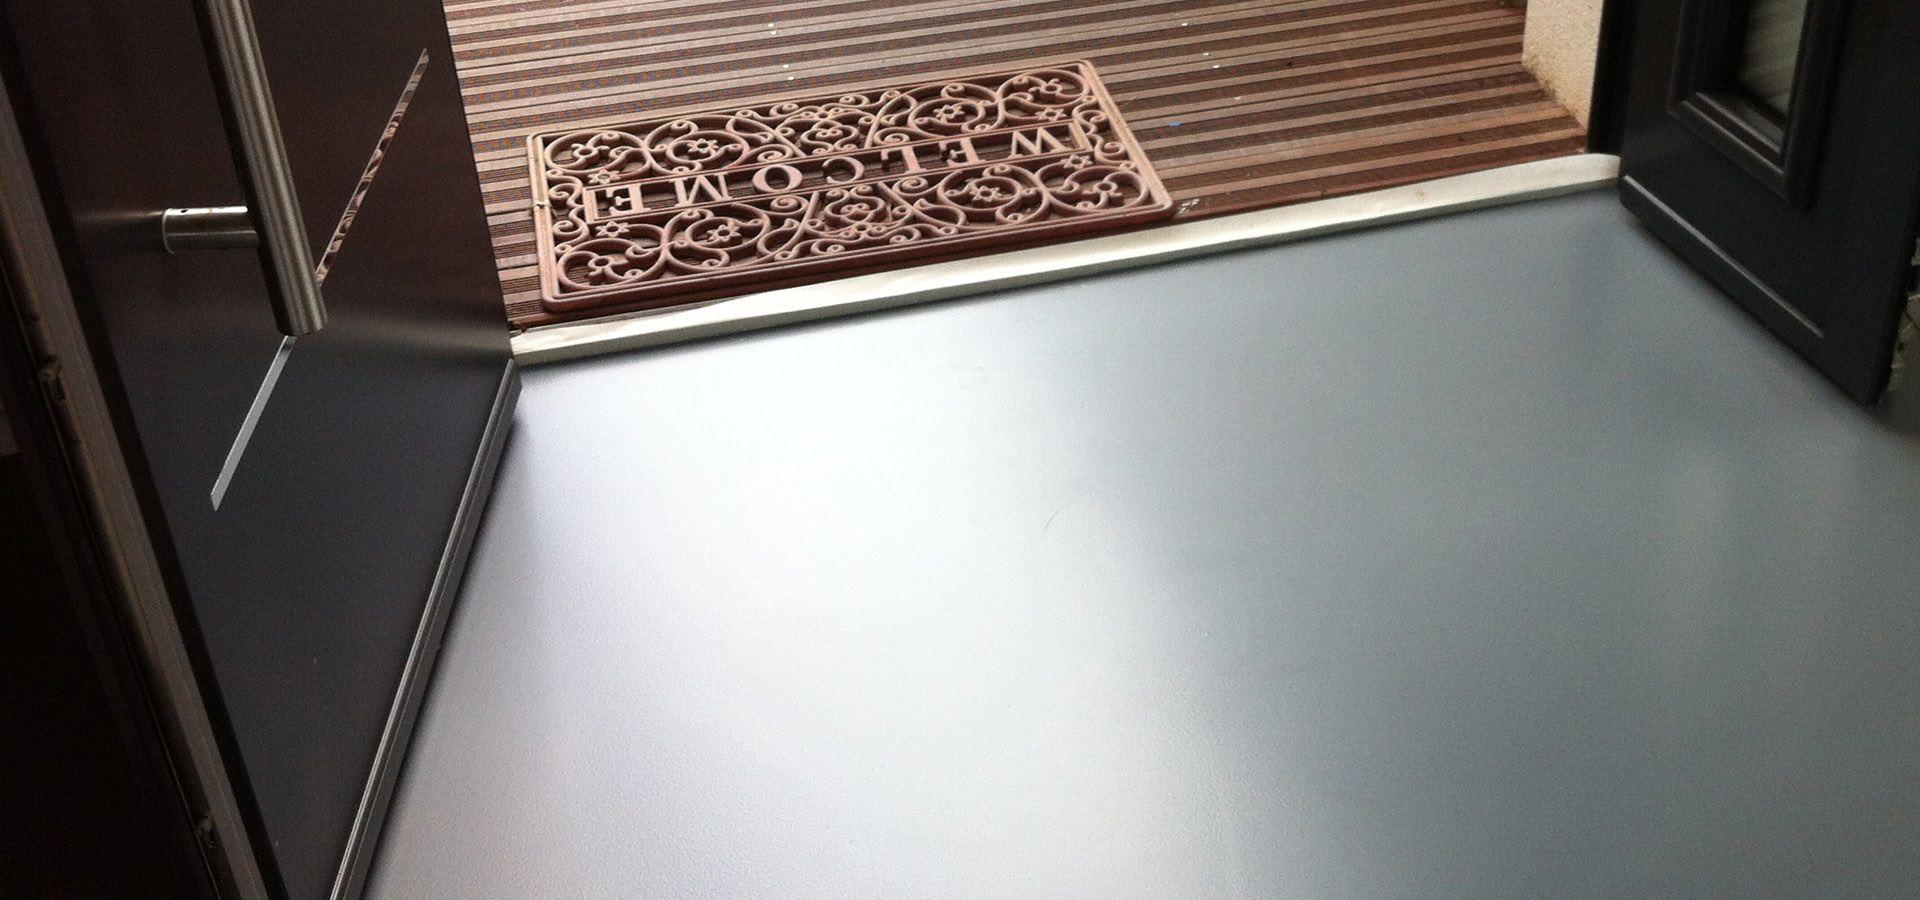 Sol resine Polyurethane mat autolississant